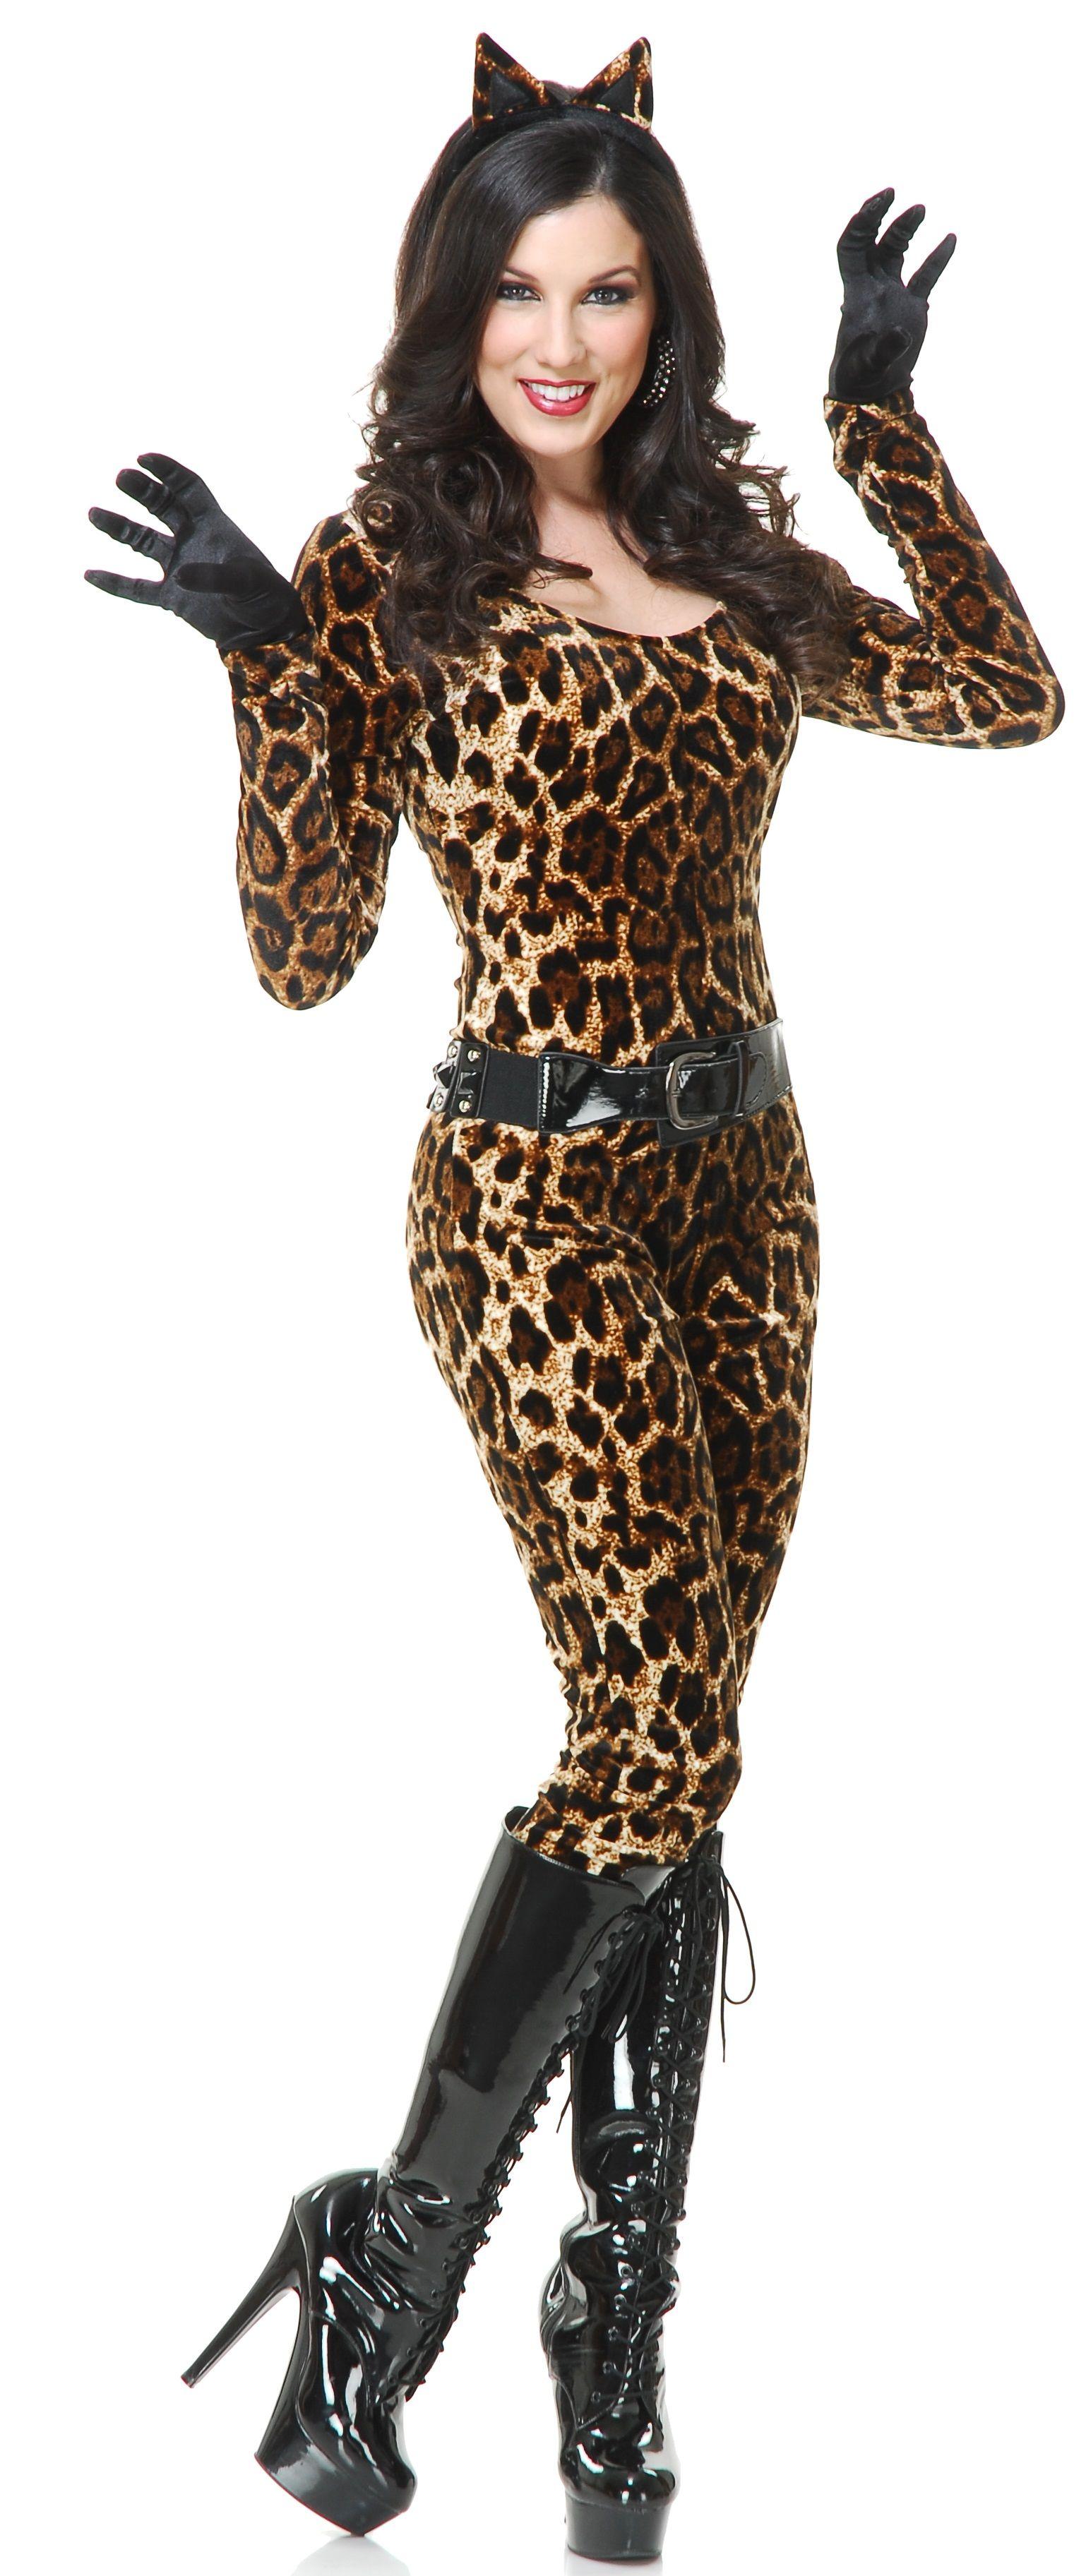 Women's Leopard Cutie Costume Calgary, Alberta. This